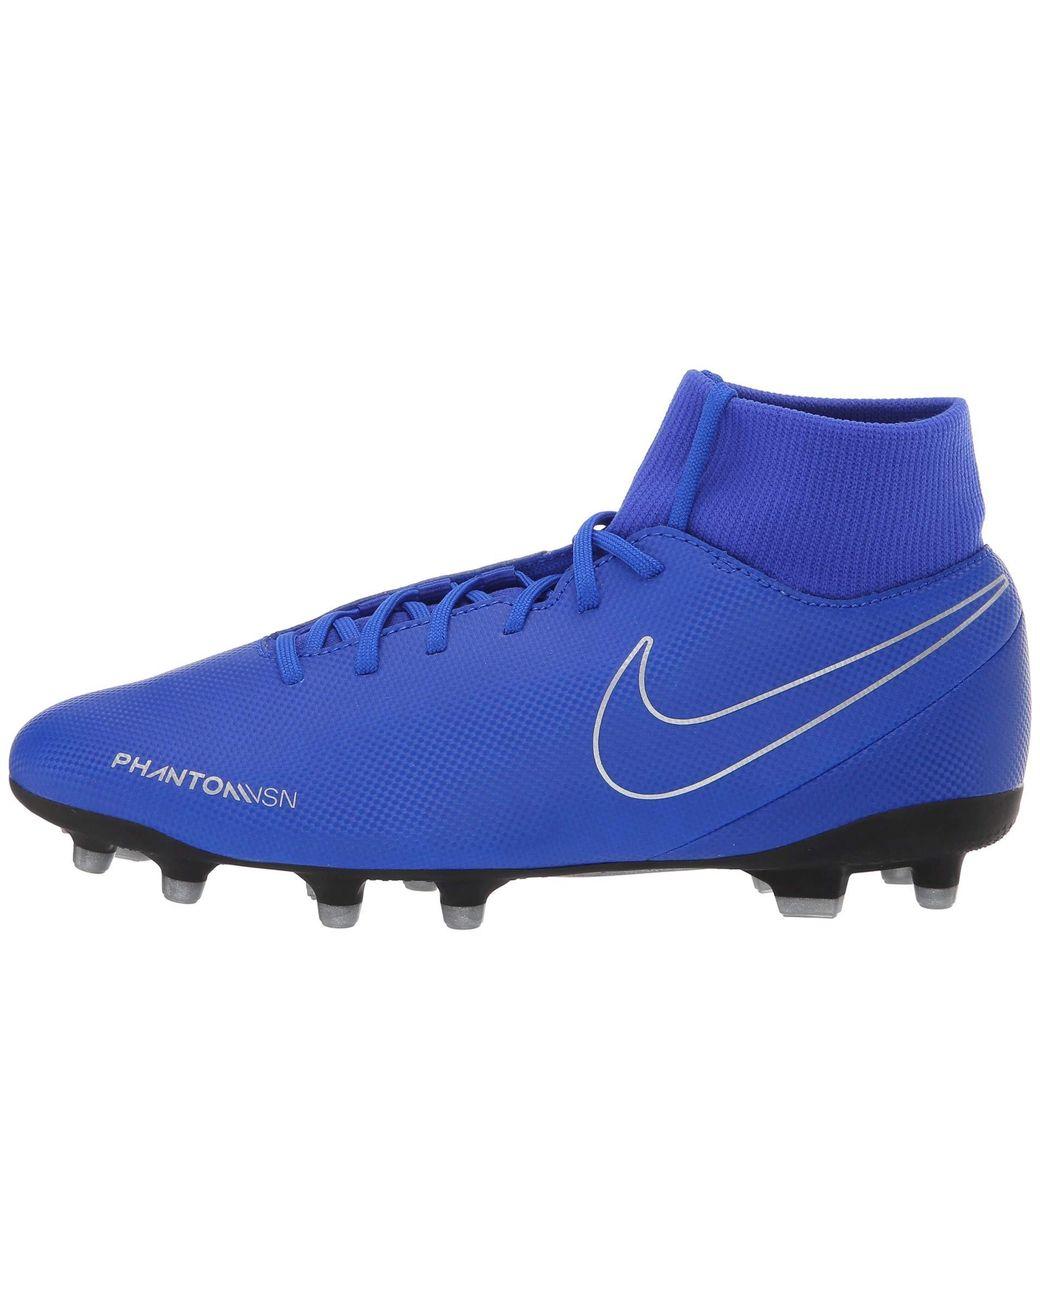 brand new 8c8ce af3de Nike Phantom Vsn Club Df Mg in Blue for Men - Save 40% - Lyst